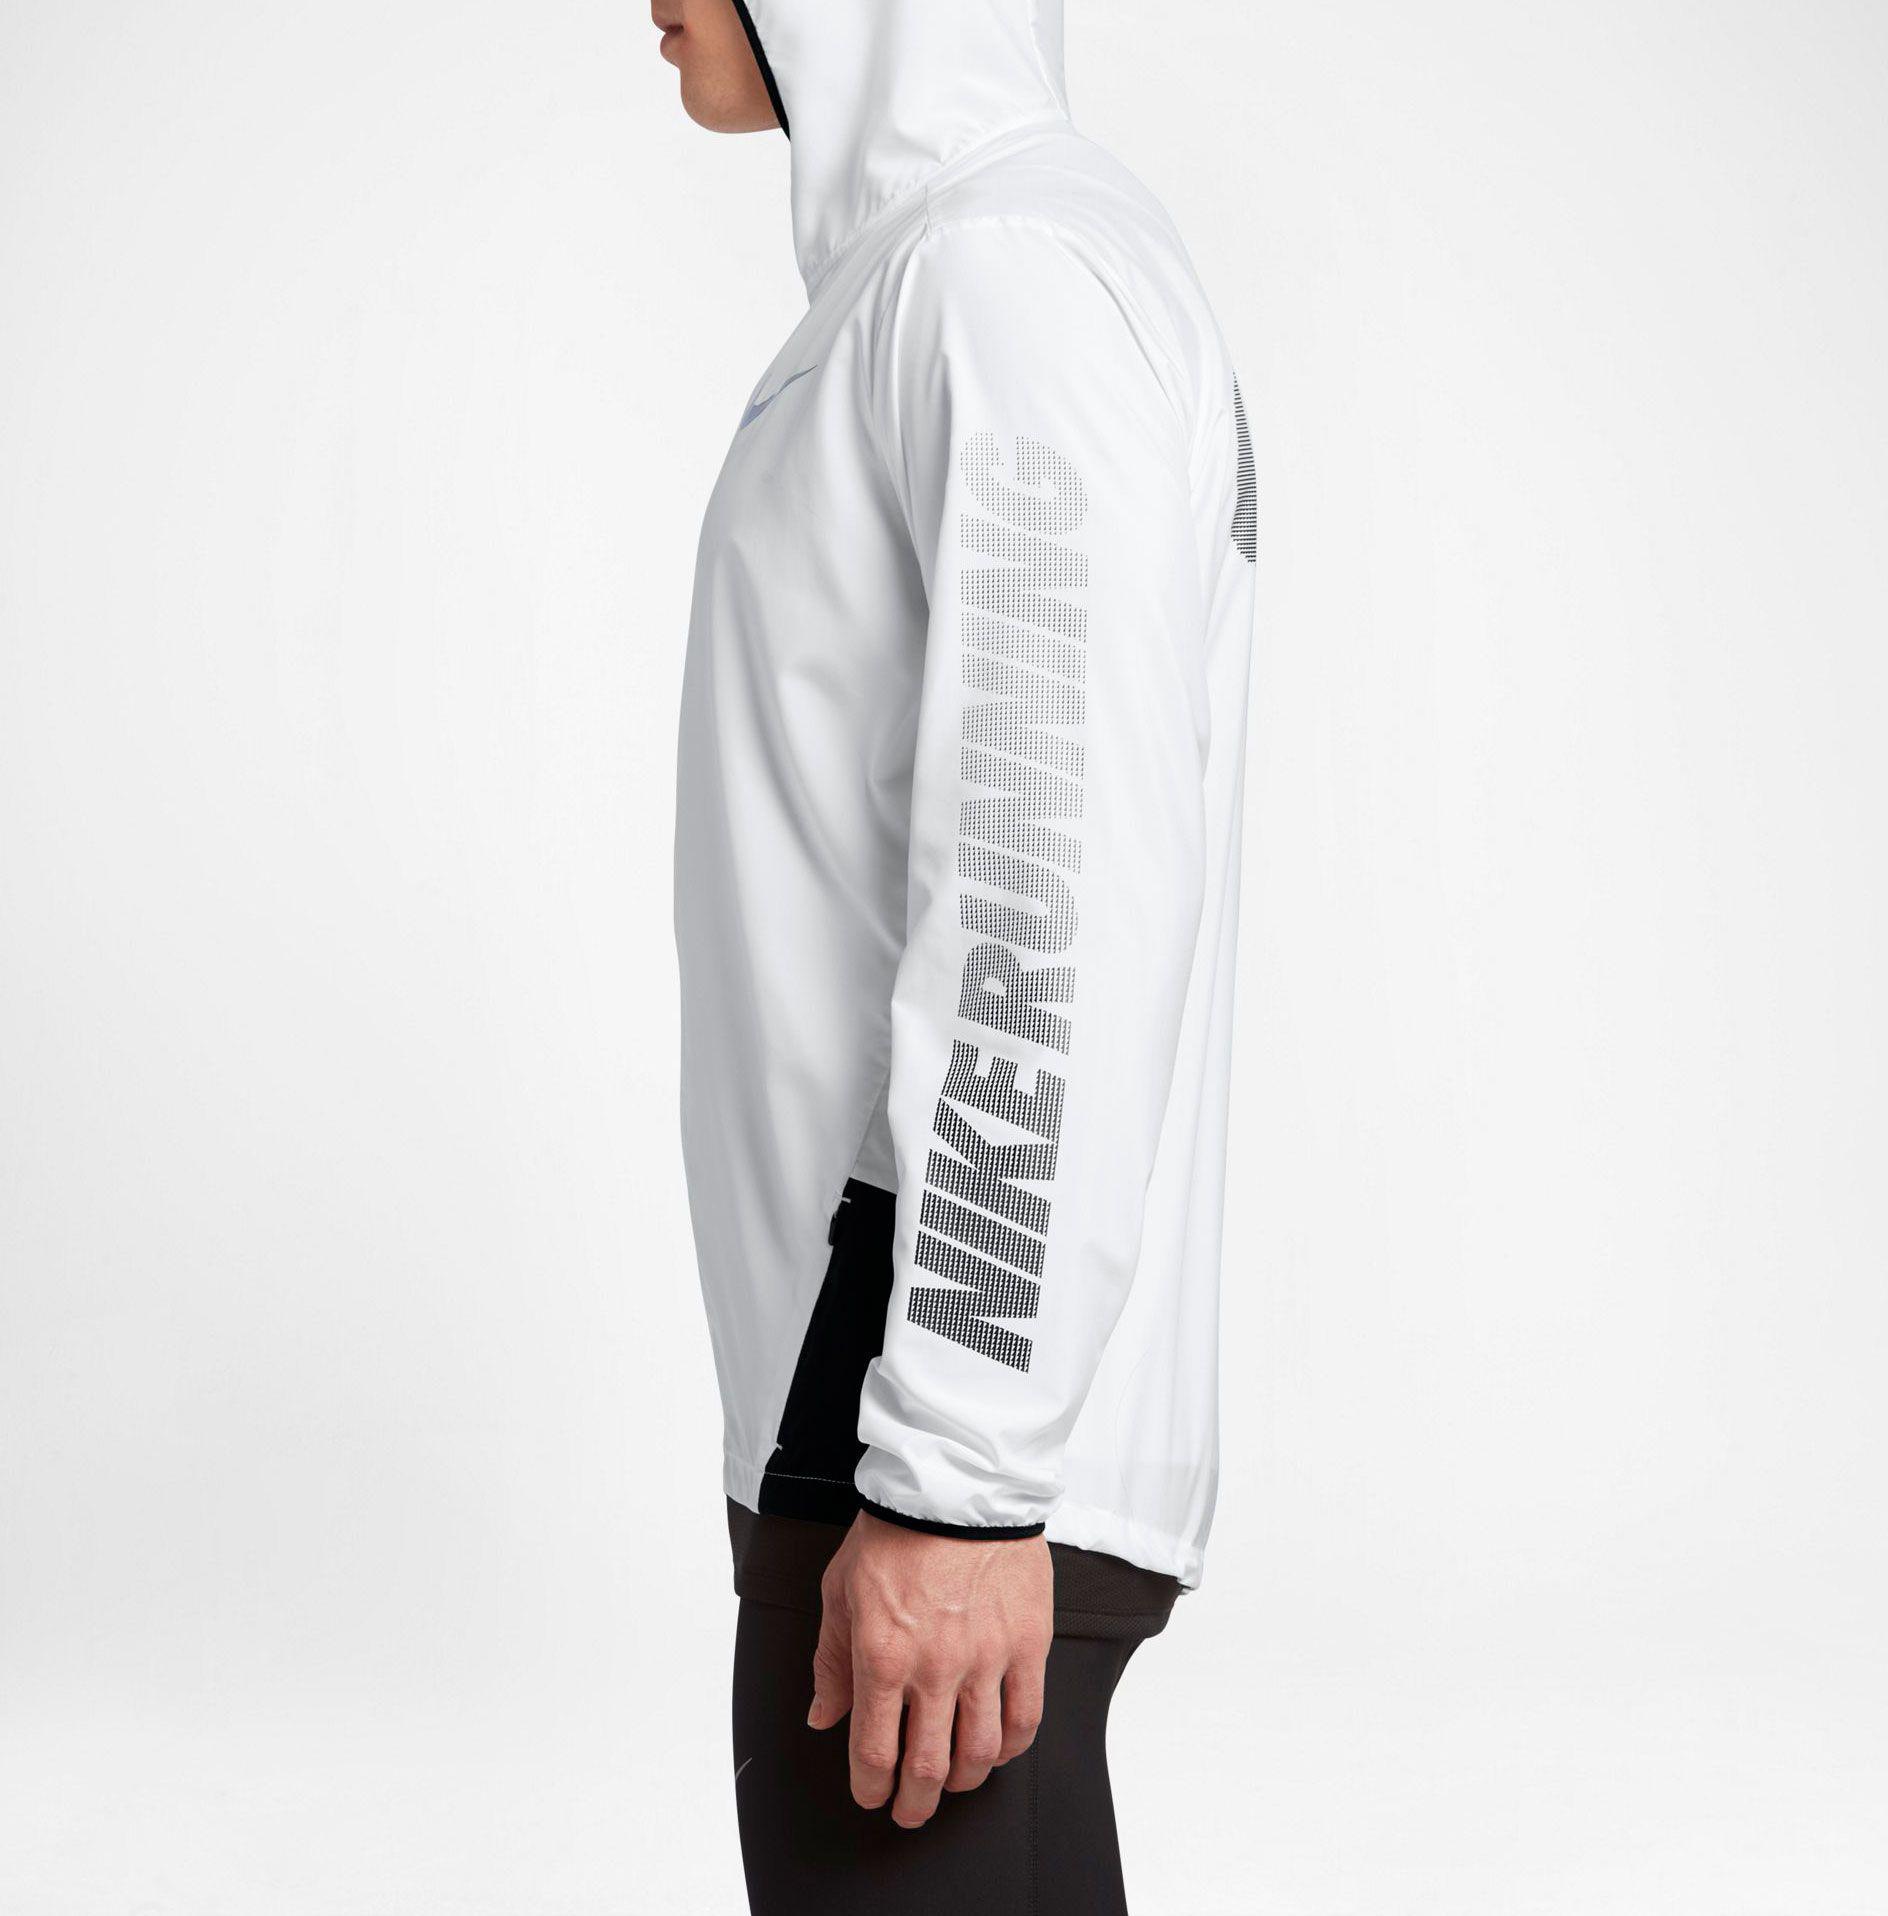 942302be6a62d Nike White City Core Full Zip Running Jacket for men